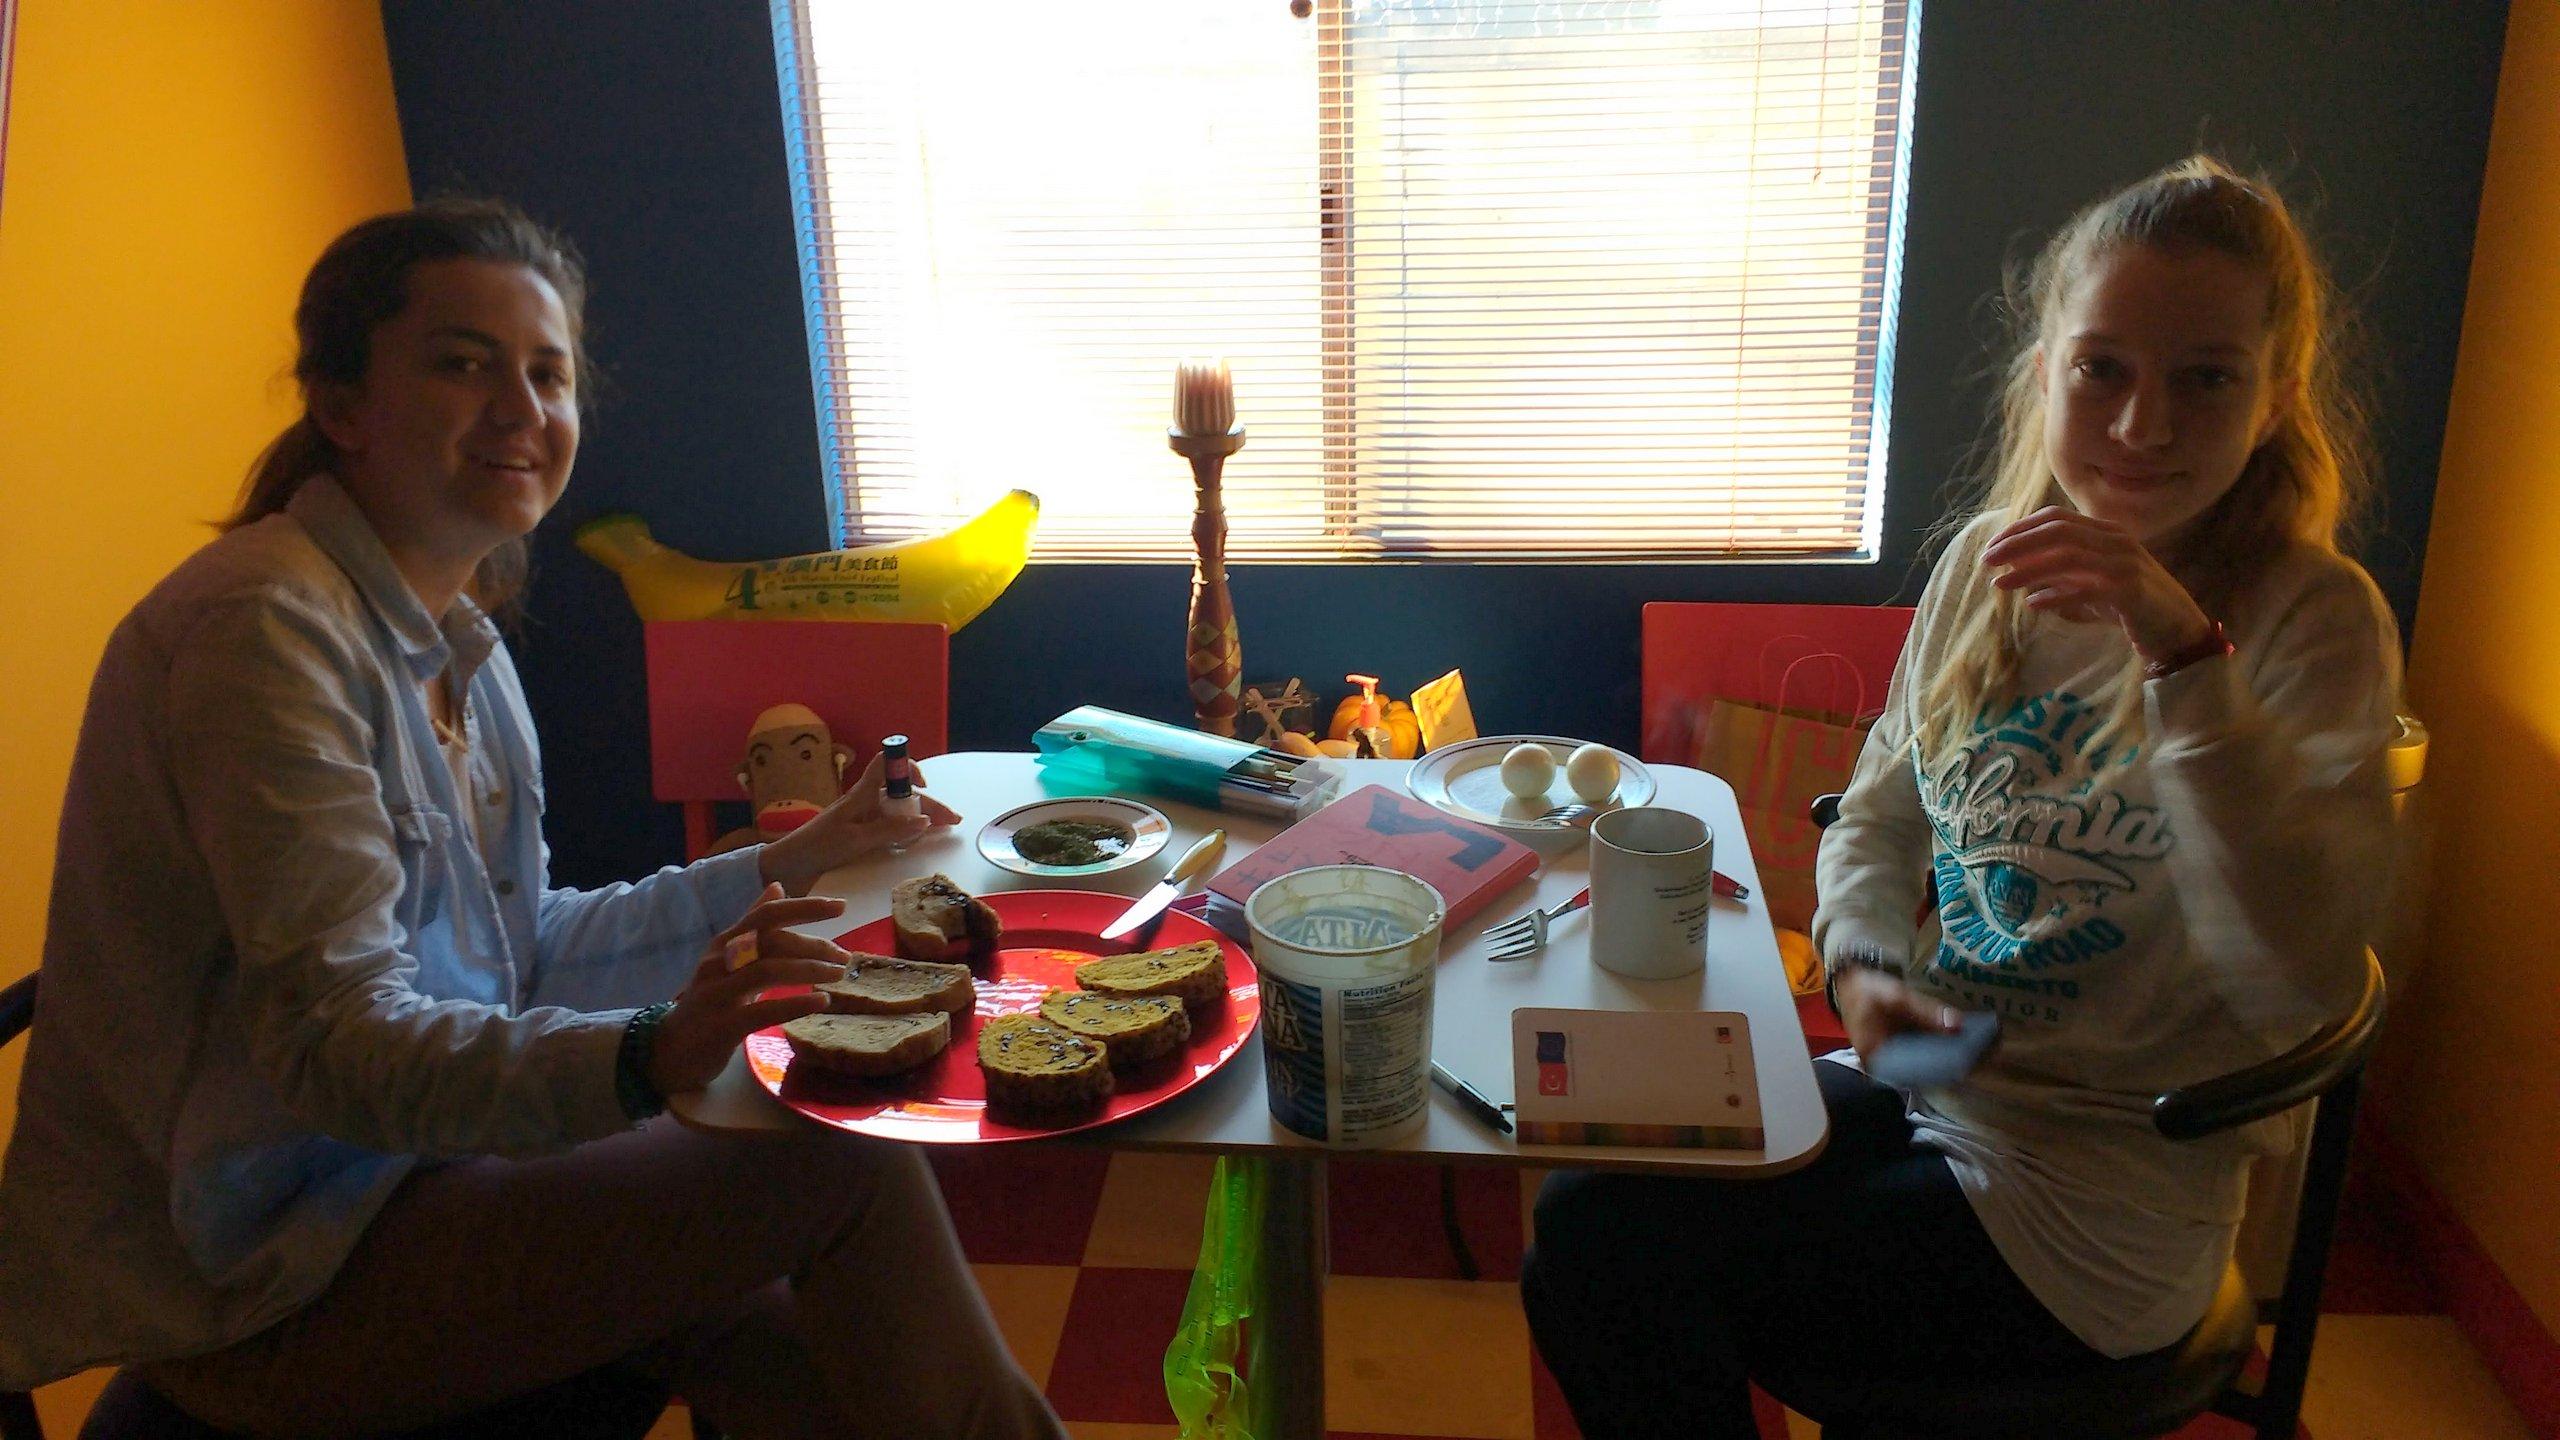 Gizem & Pinar having breakfast in the morning